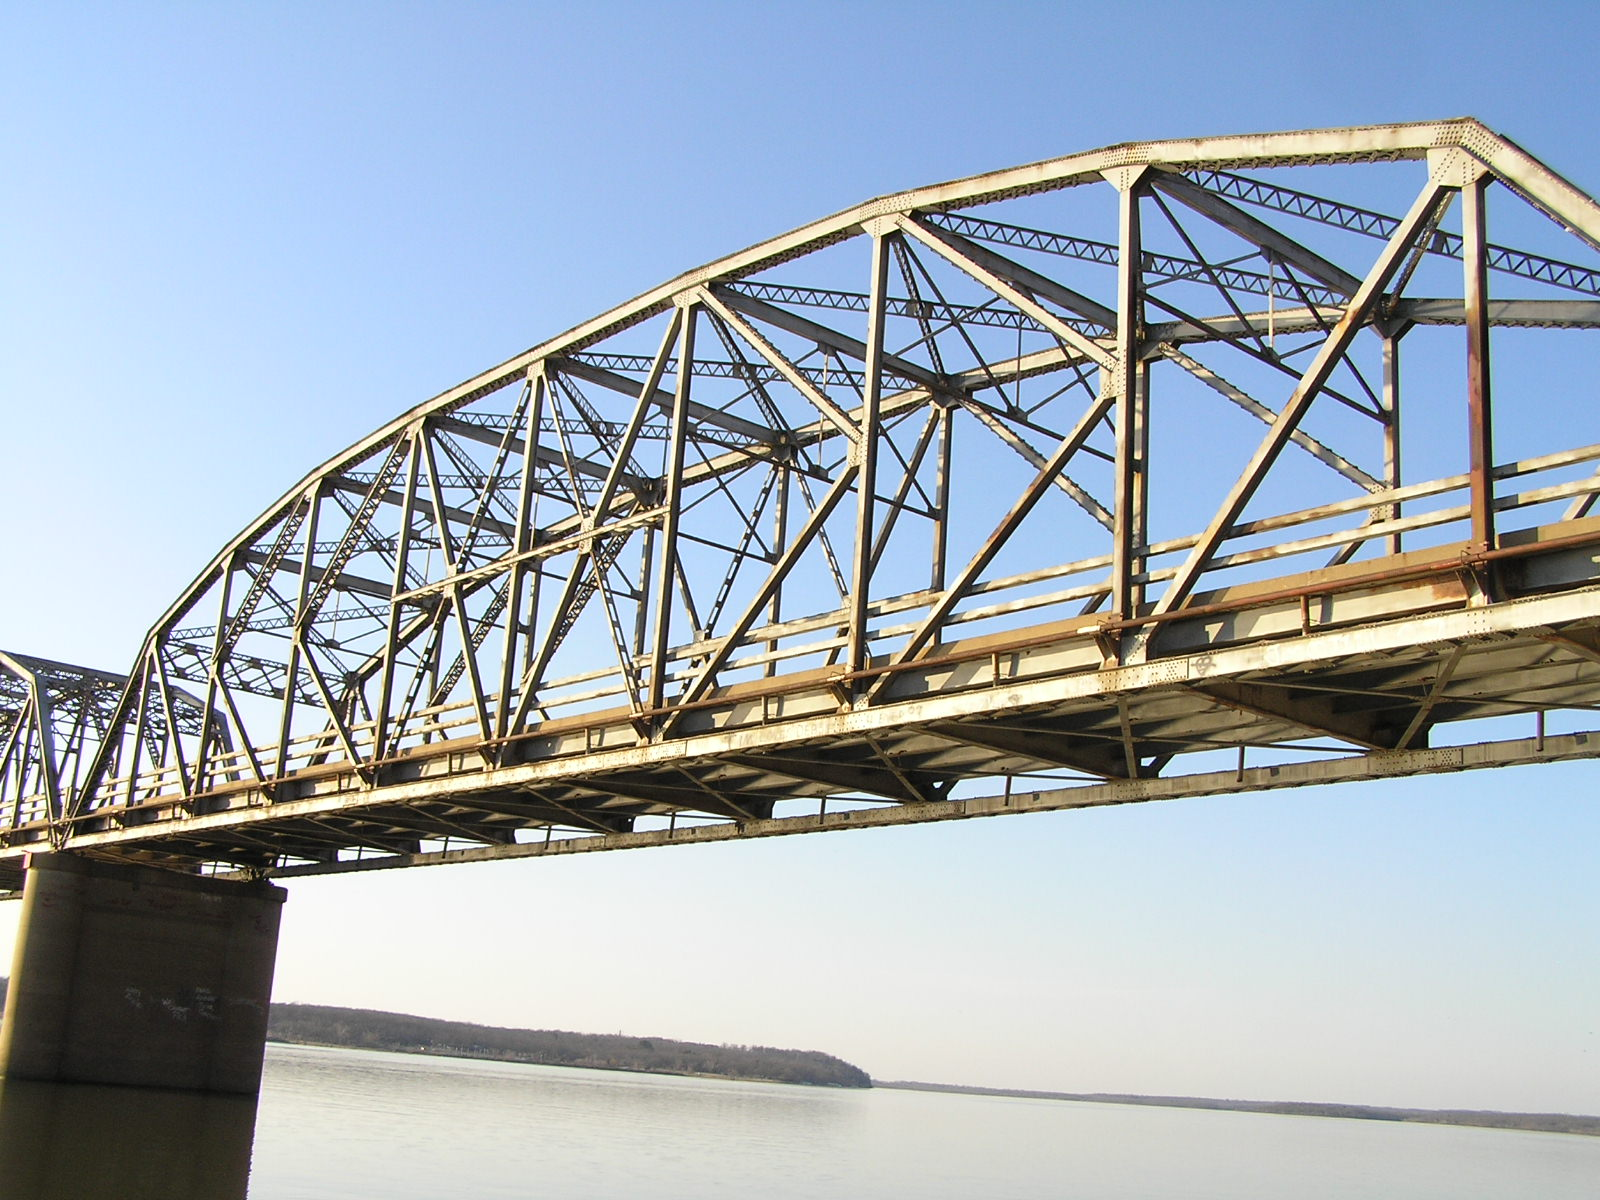 truss bridges in oklahoma